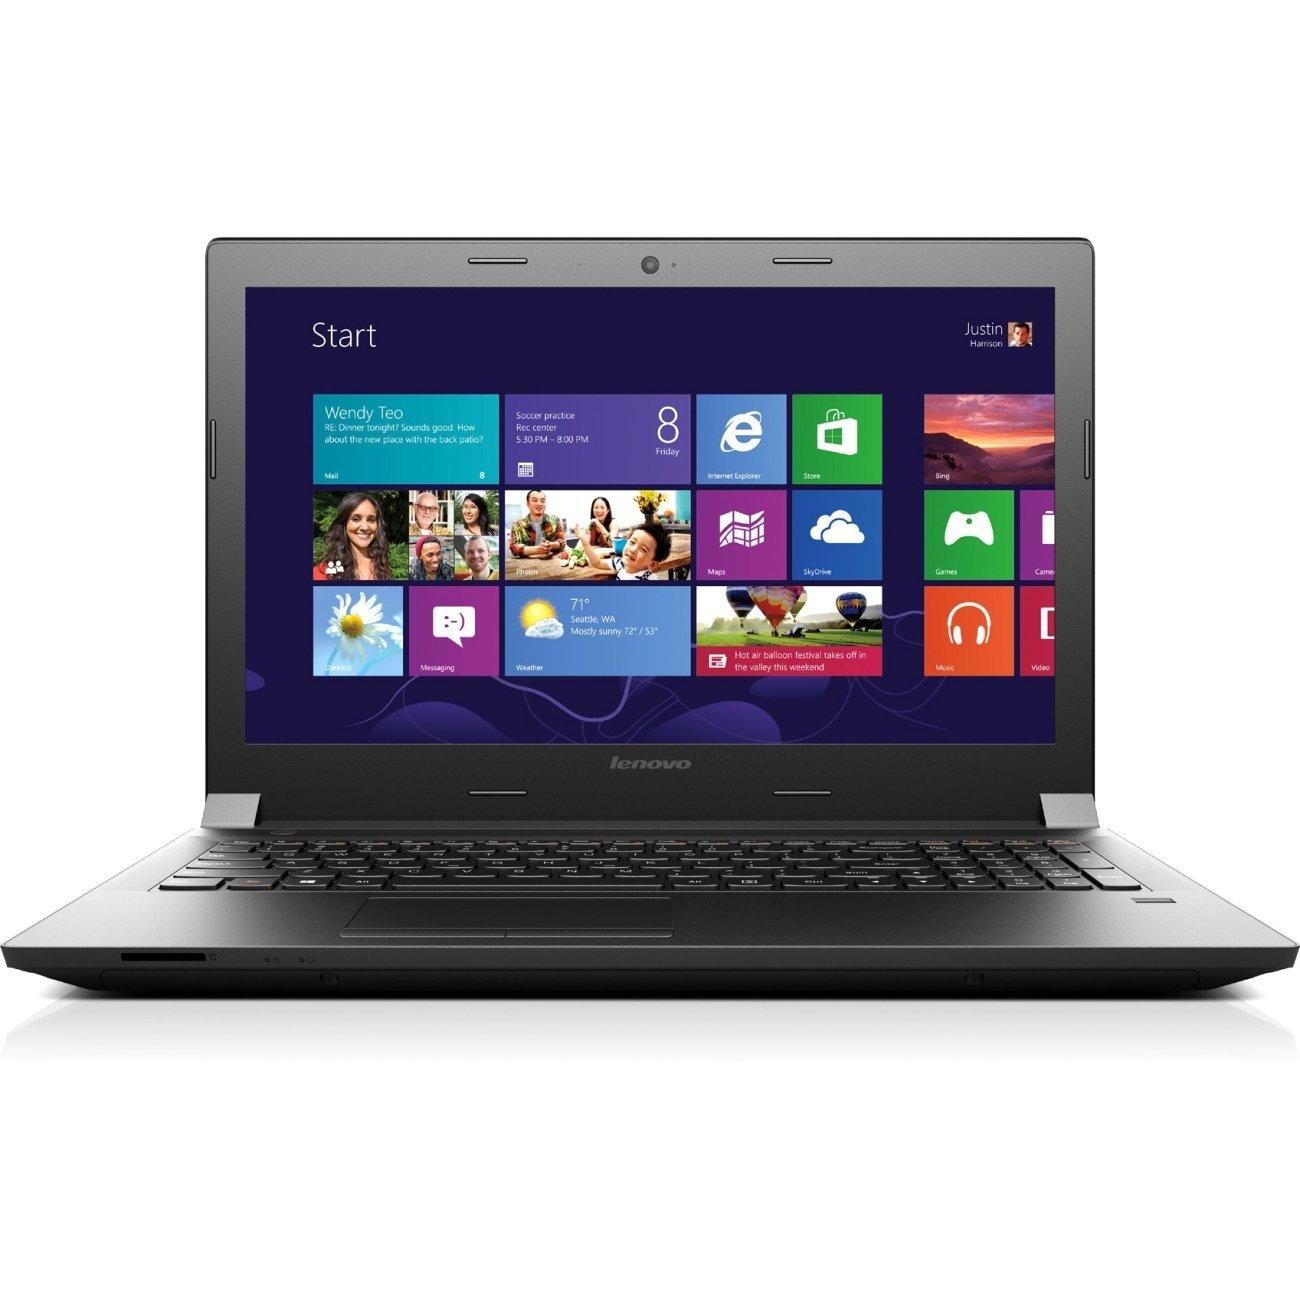 "Lenovo B40 Laptop: Intel Core i3-4005U, 14"" LED, 4GB DDR3, 500GB HDD, Win10  $260 + Free Shipping"